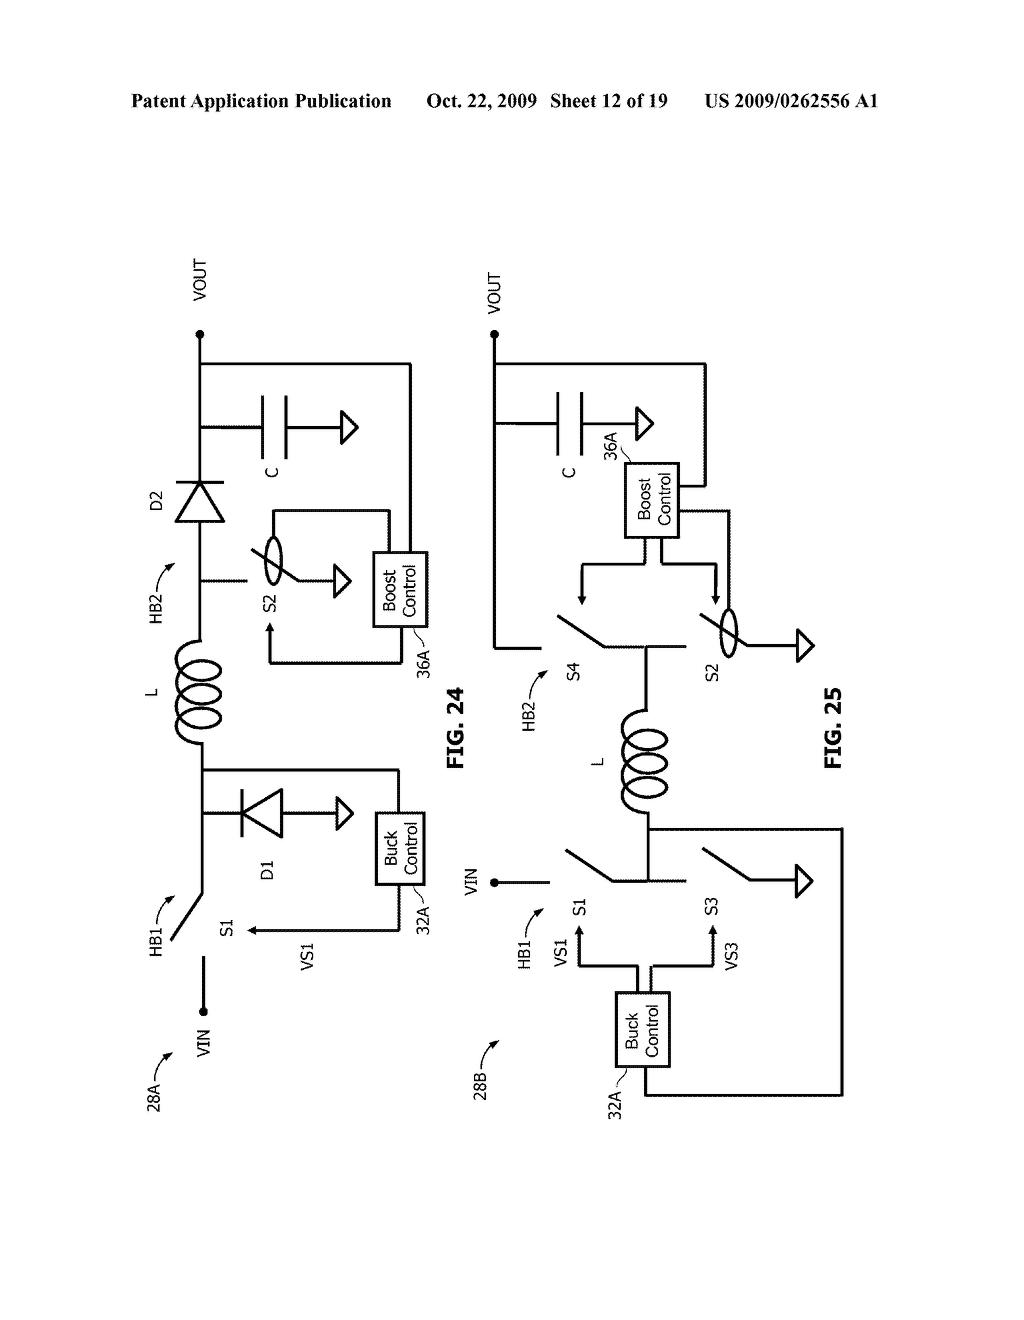 H Bridge Buck Boost Converter Diagram Schematic And Image 13 Circuit Design